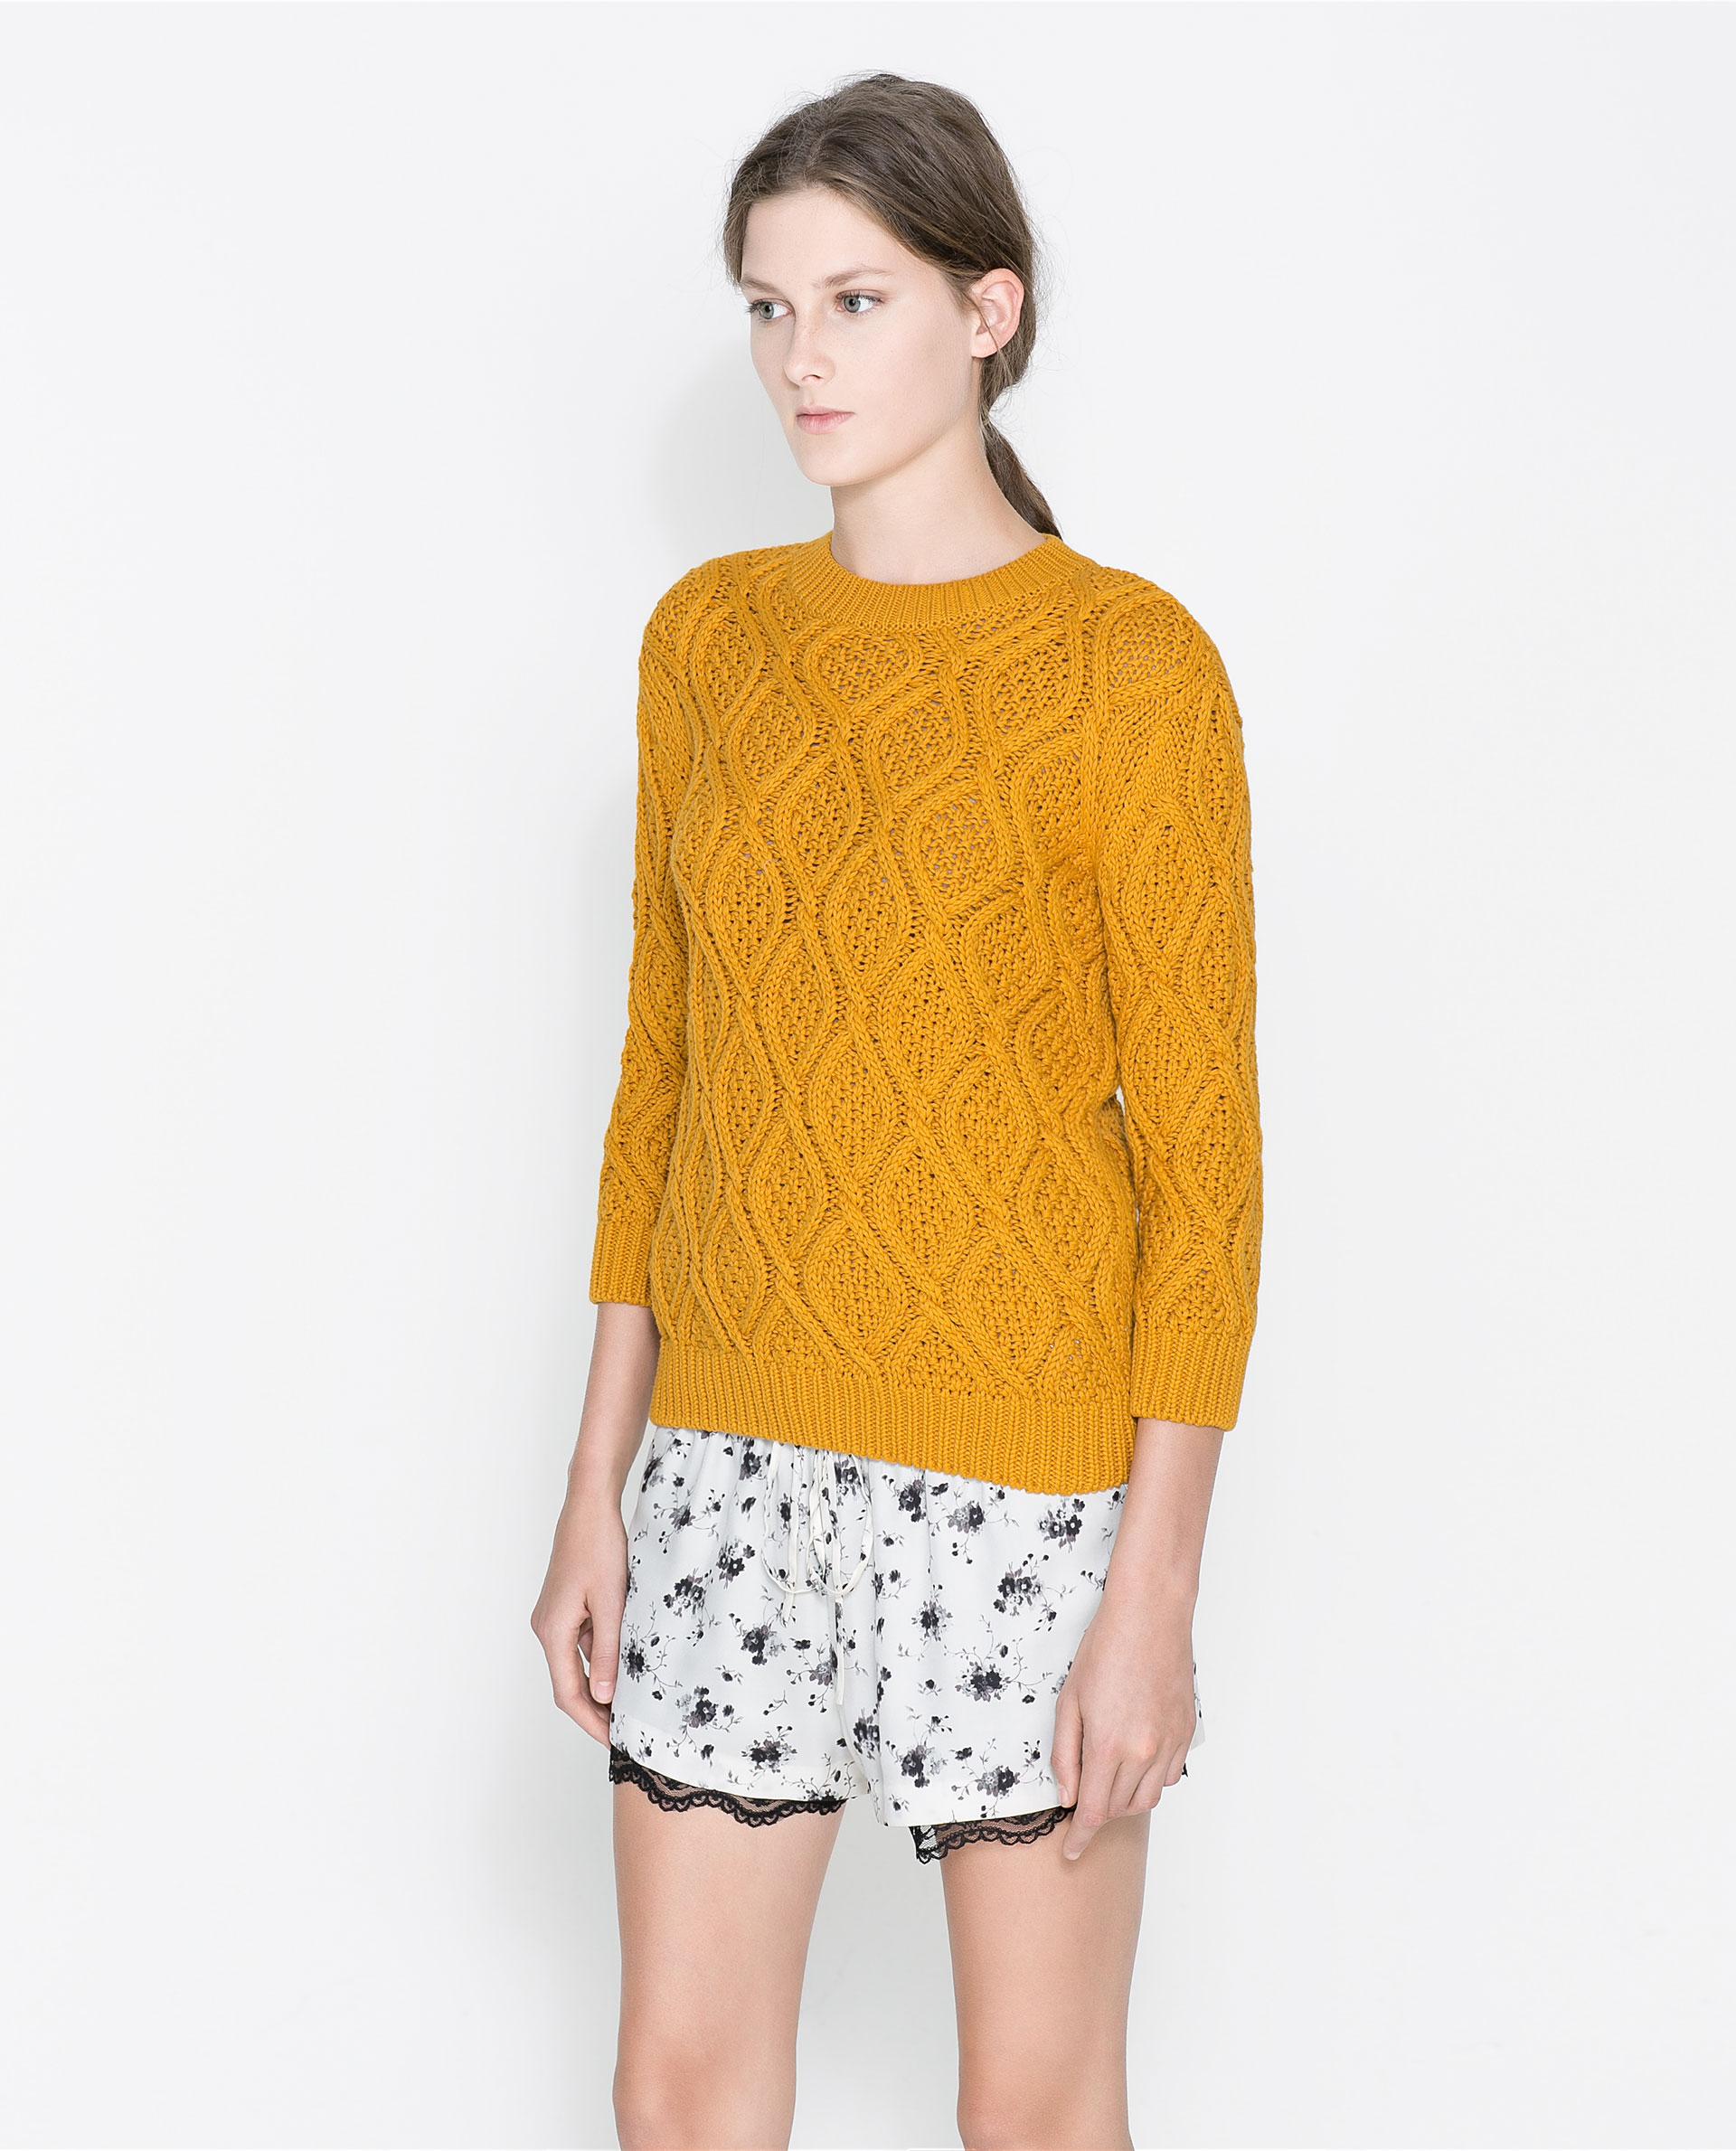 Christian Sweaters